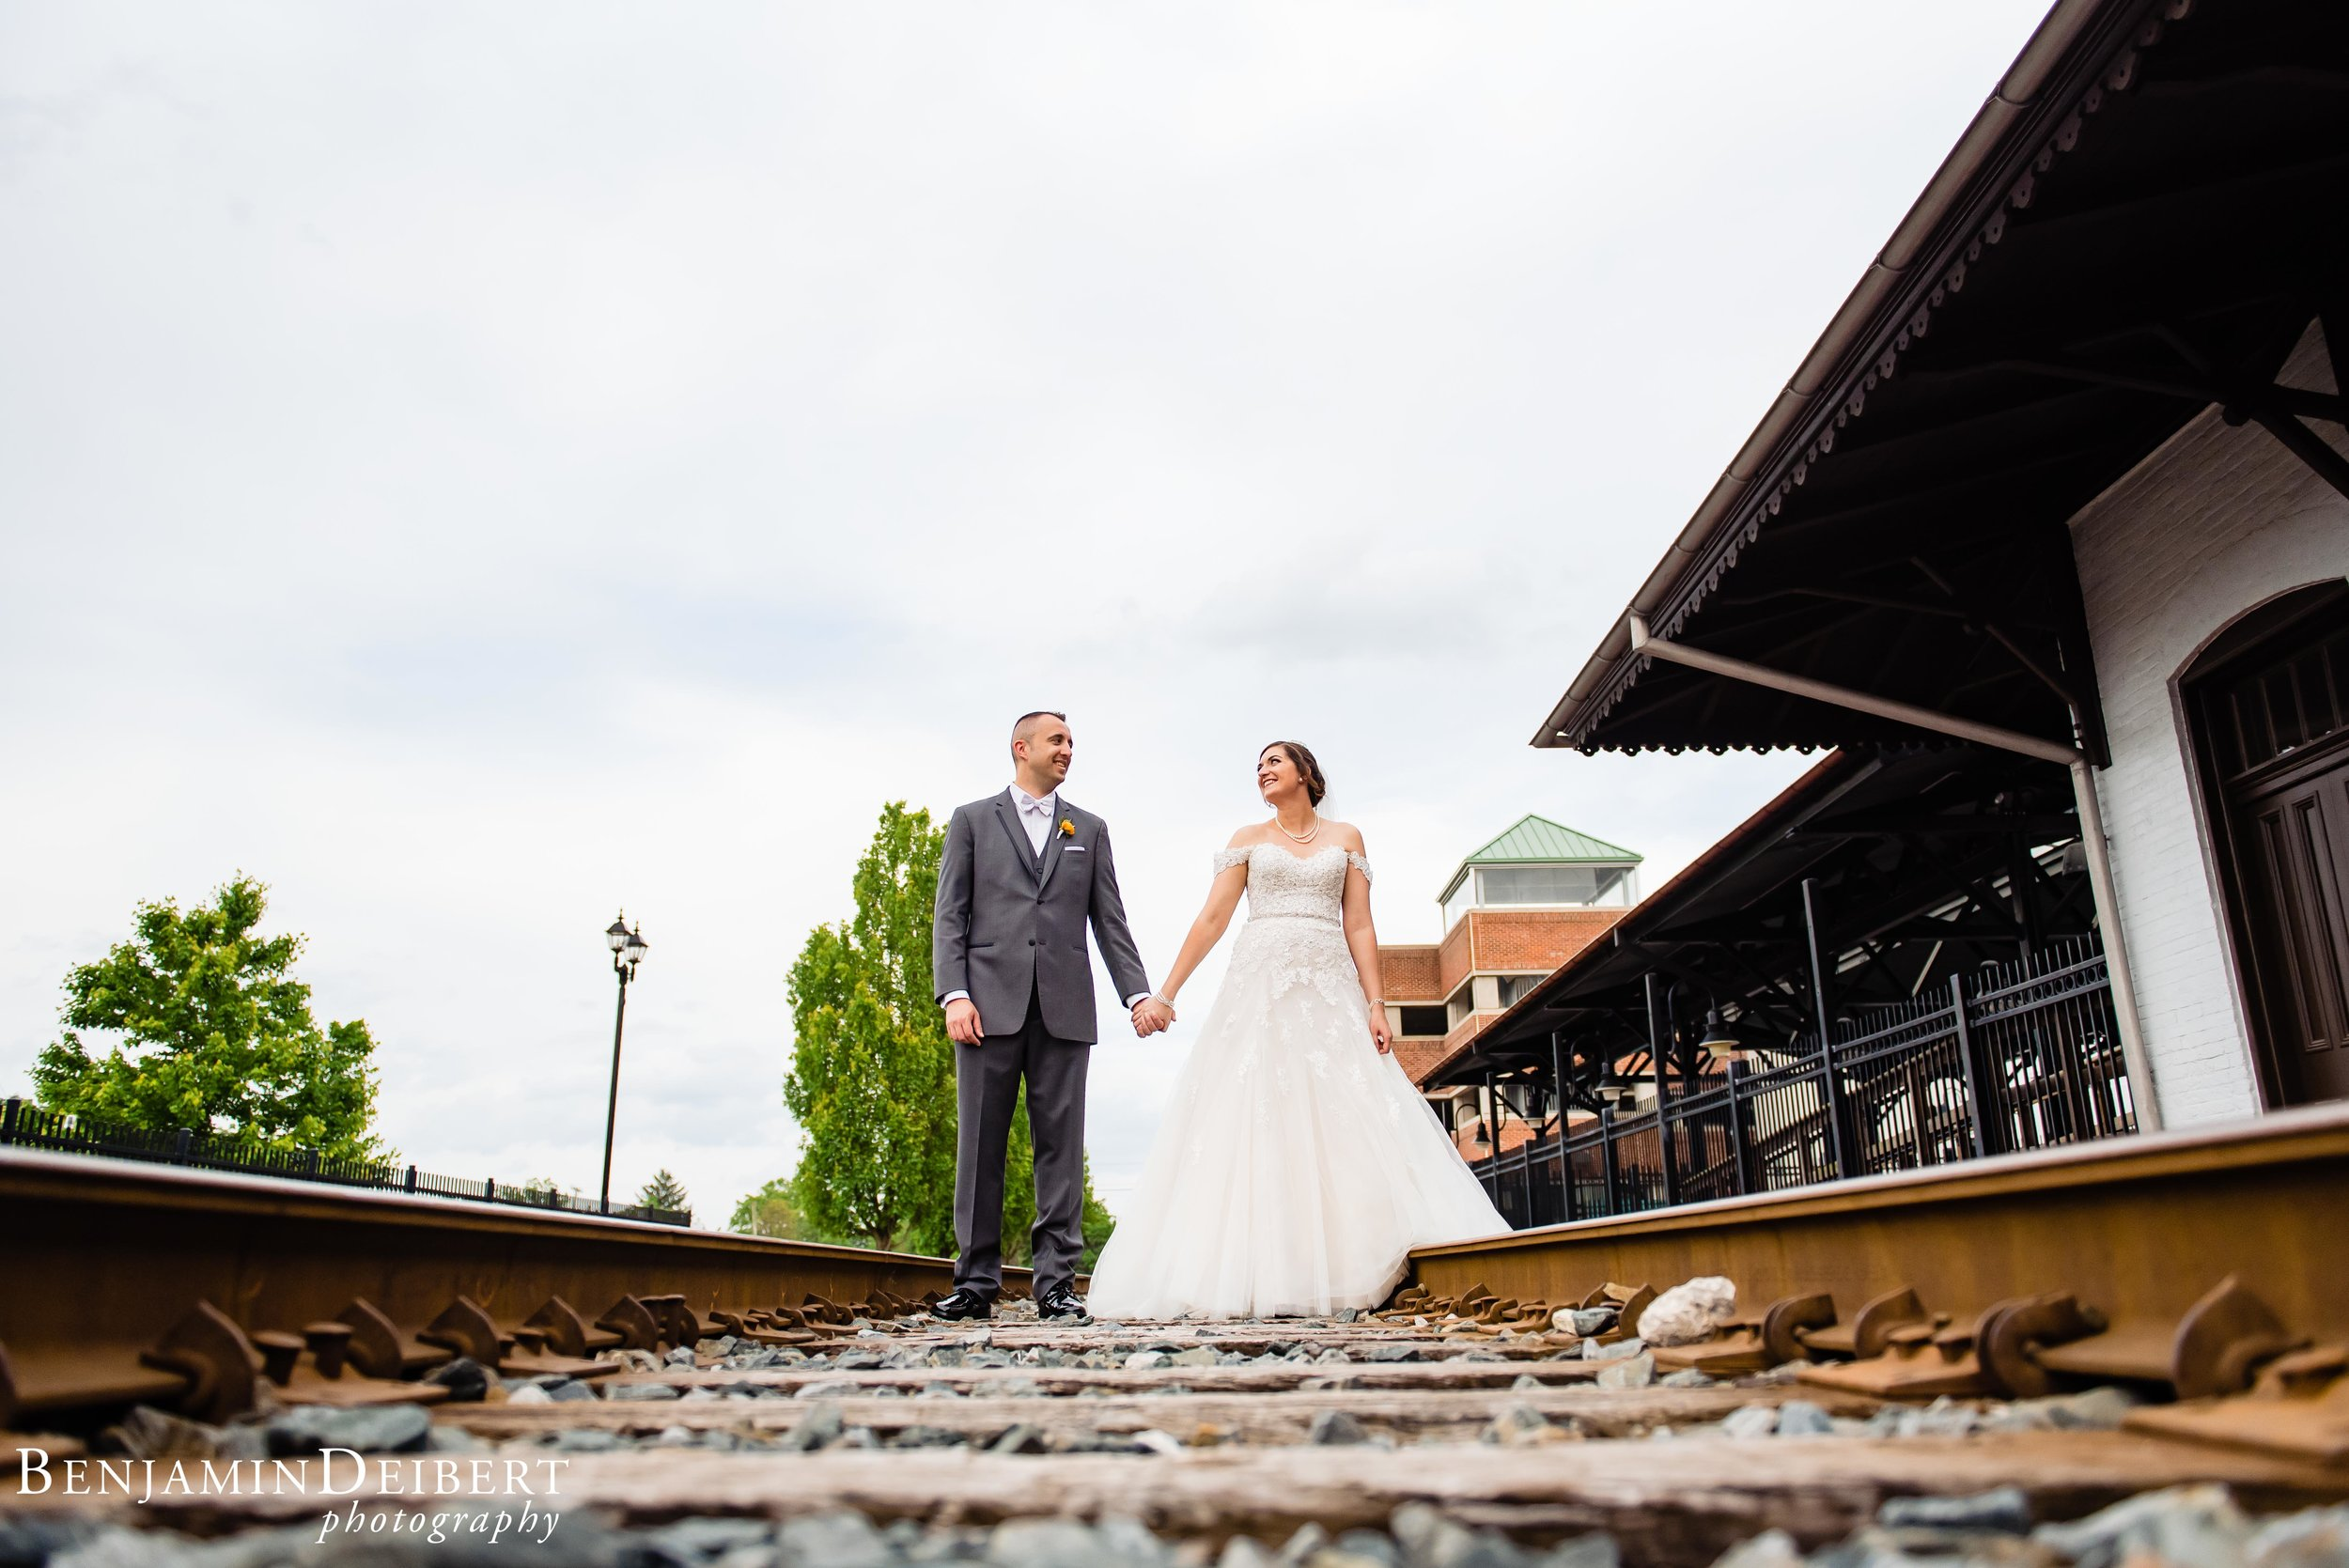 Meighan and Michael_Gettysburg Hotel Train Station_Wedding-4.jpg